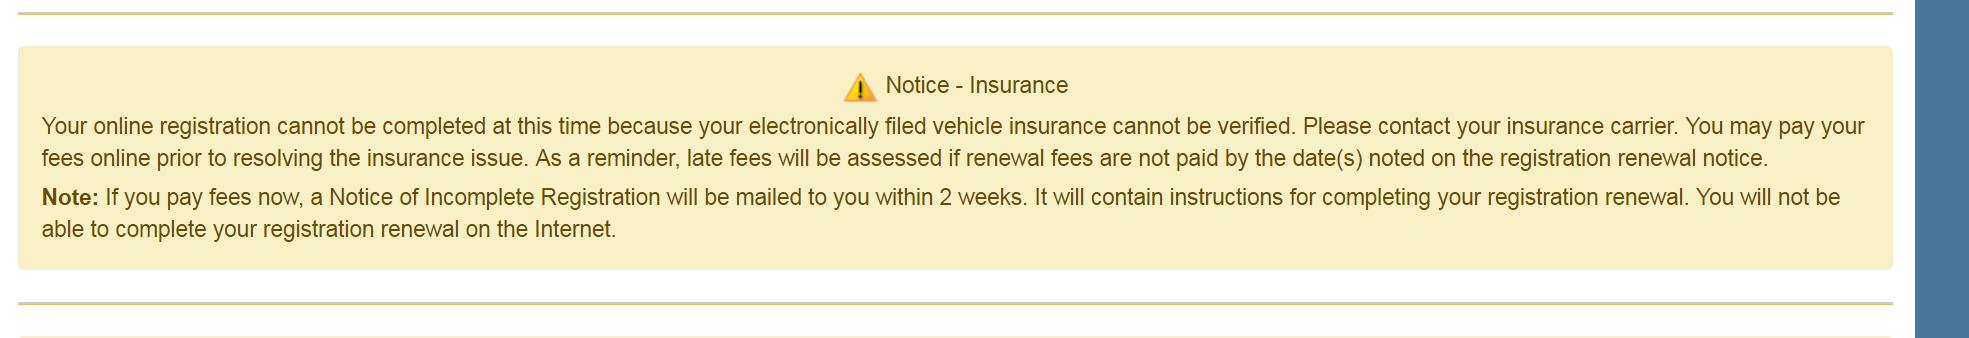 screenshot-www.dmv.ca.gov-2019.10.02-08_49_06.png